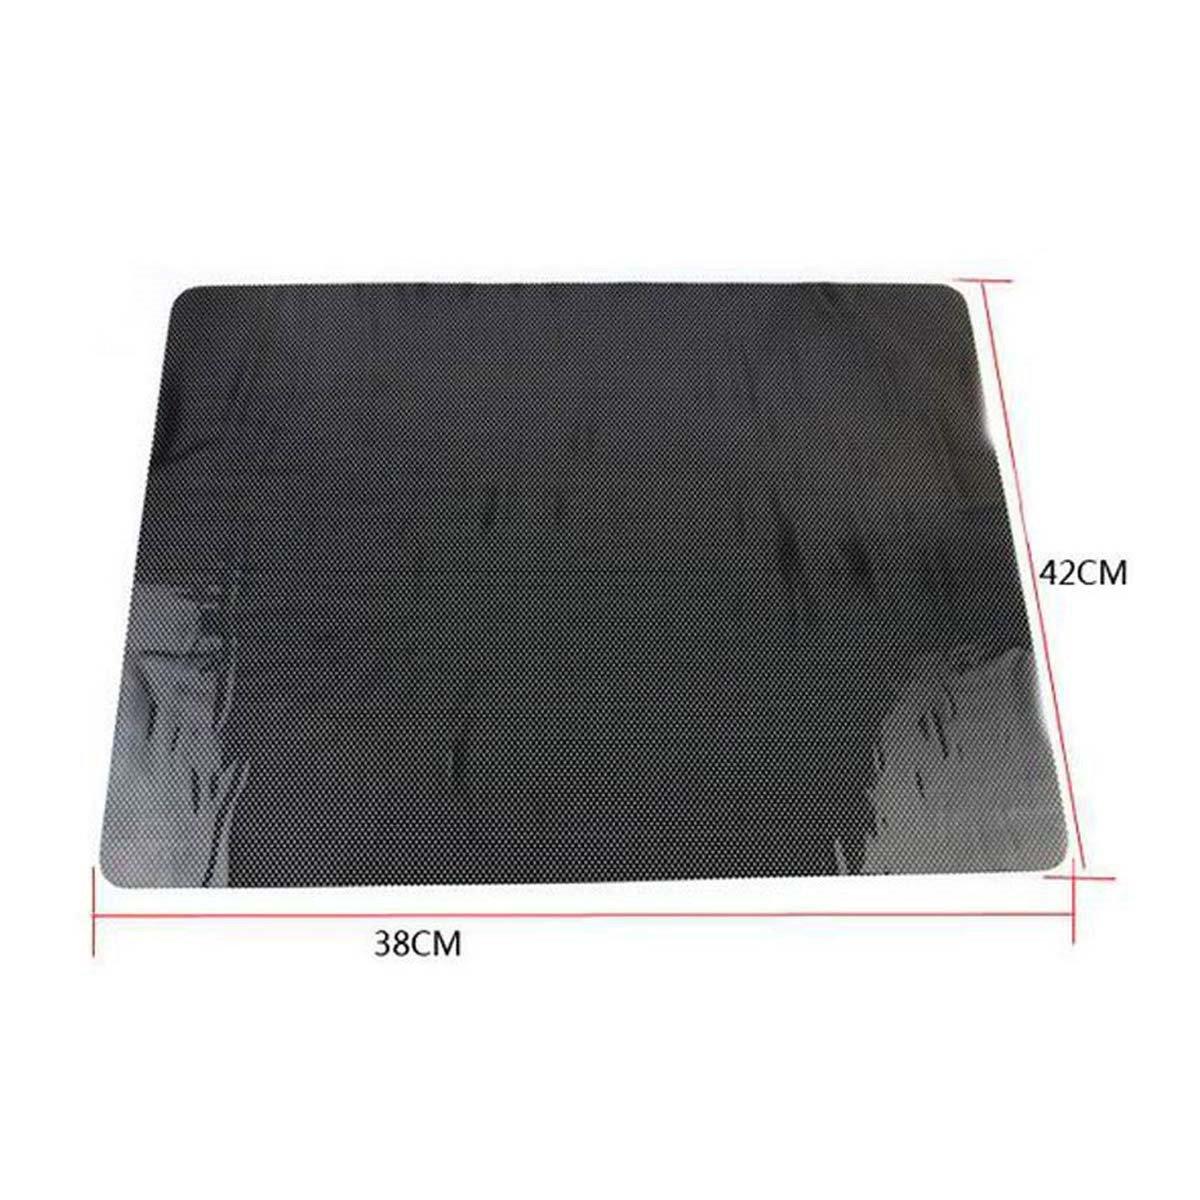 2pcs//lot 70x49cm Uv Sticker Car Sunshade Electrostatic Stickers ECYC/® Car Window Shade Stickers for Side and Rear Window